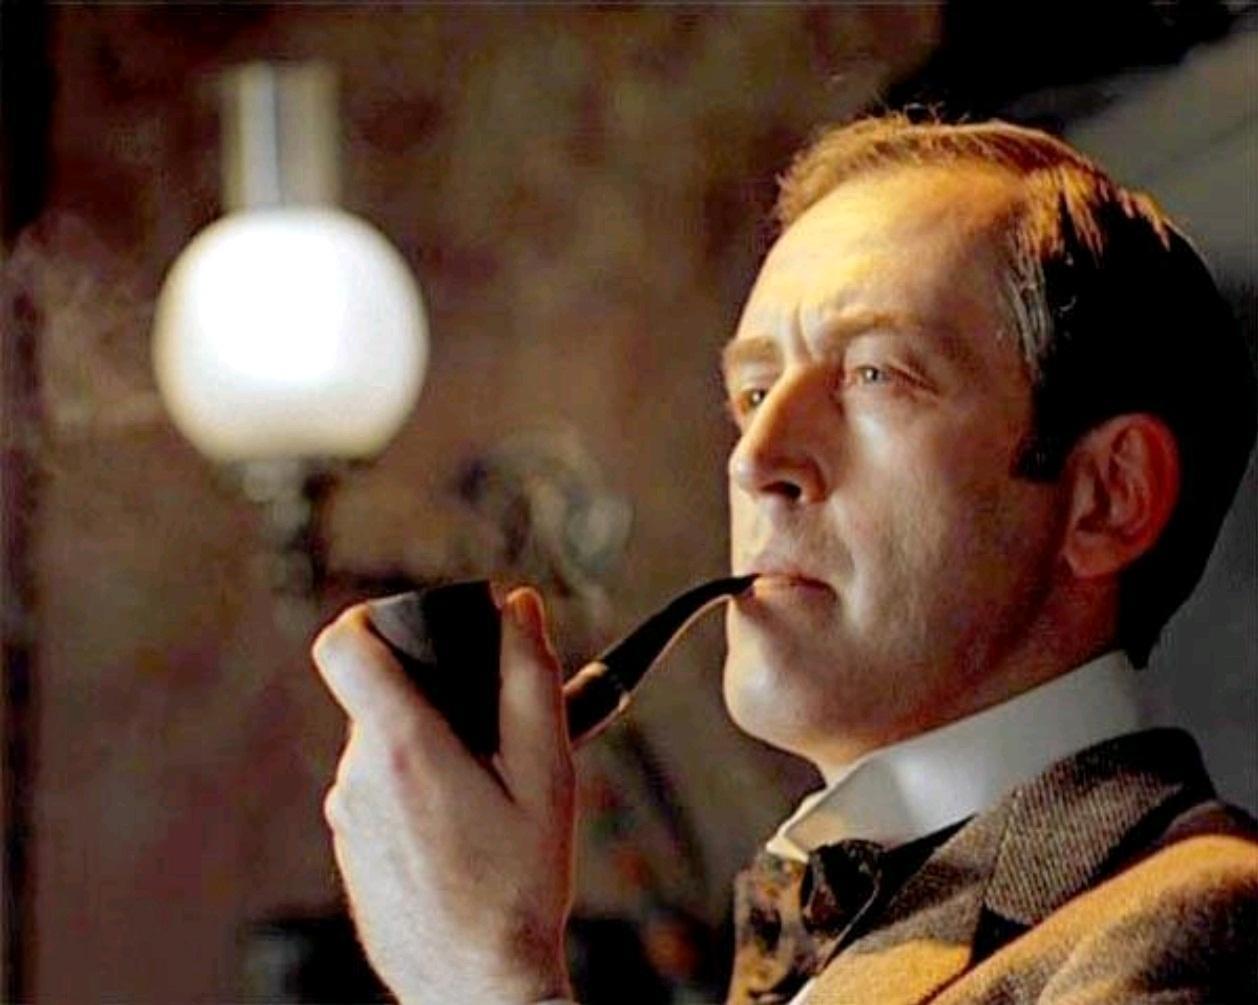 шерлок холмс и доктор ватсон знакомство 1979 i